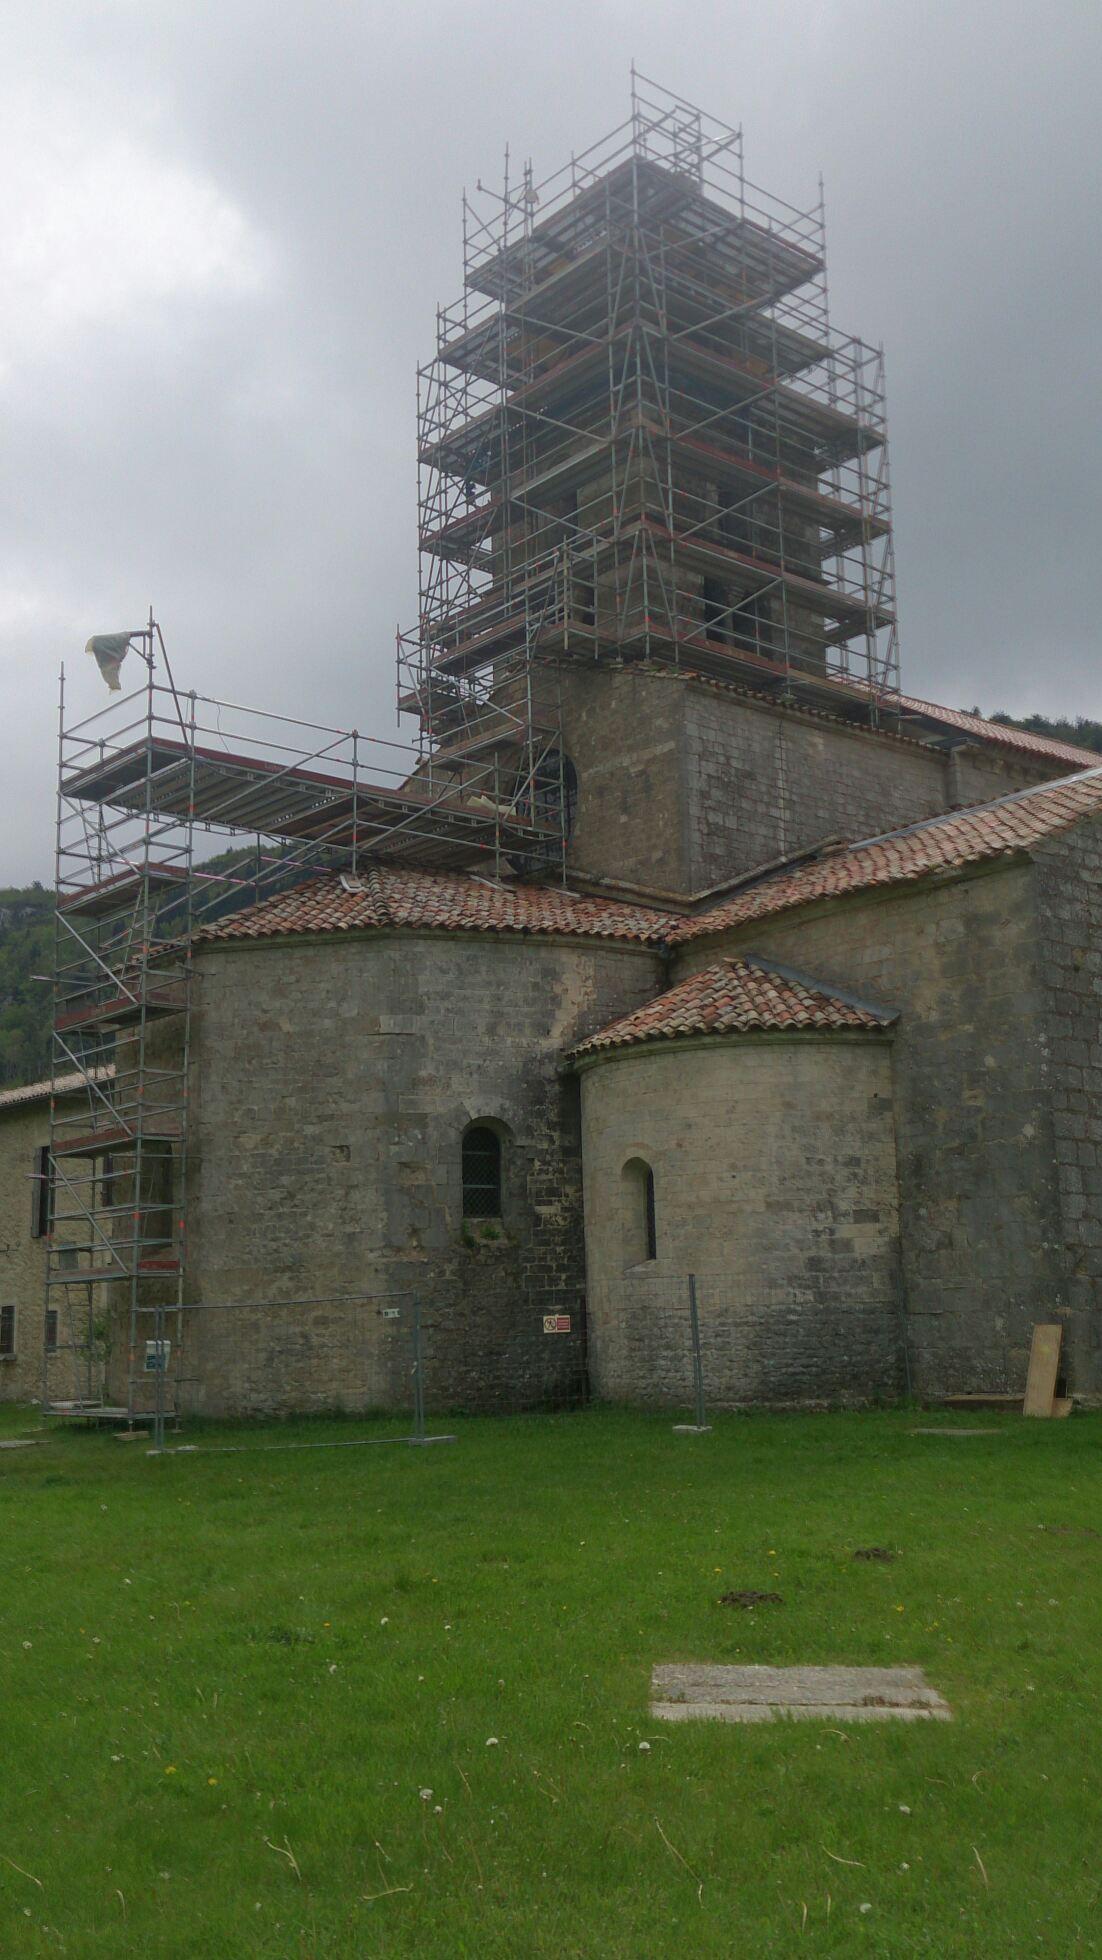 Eglise_de_Leoncel_Echafaudage_Drôme_Rhône-Alpes_Elévation.jpg